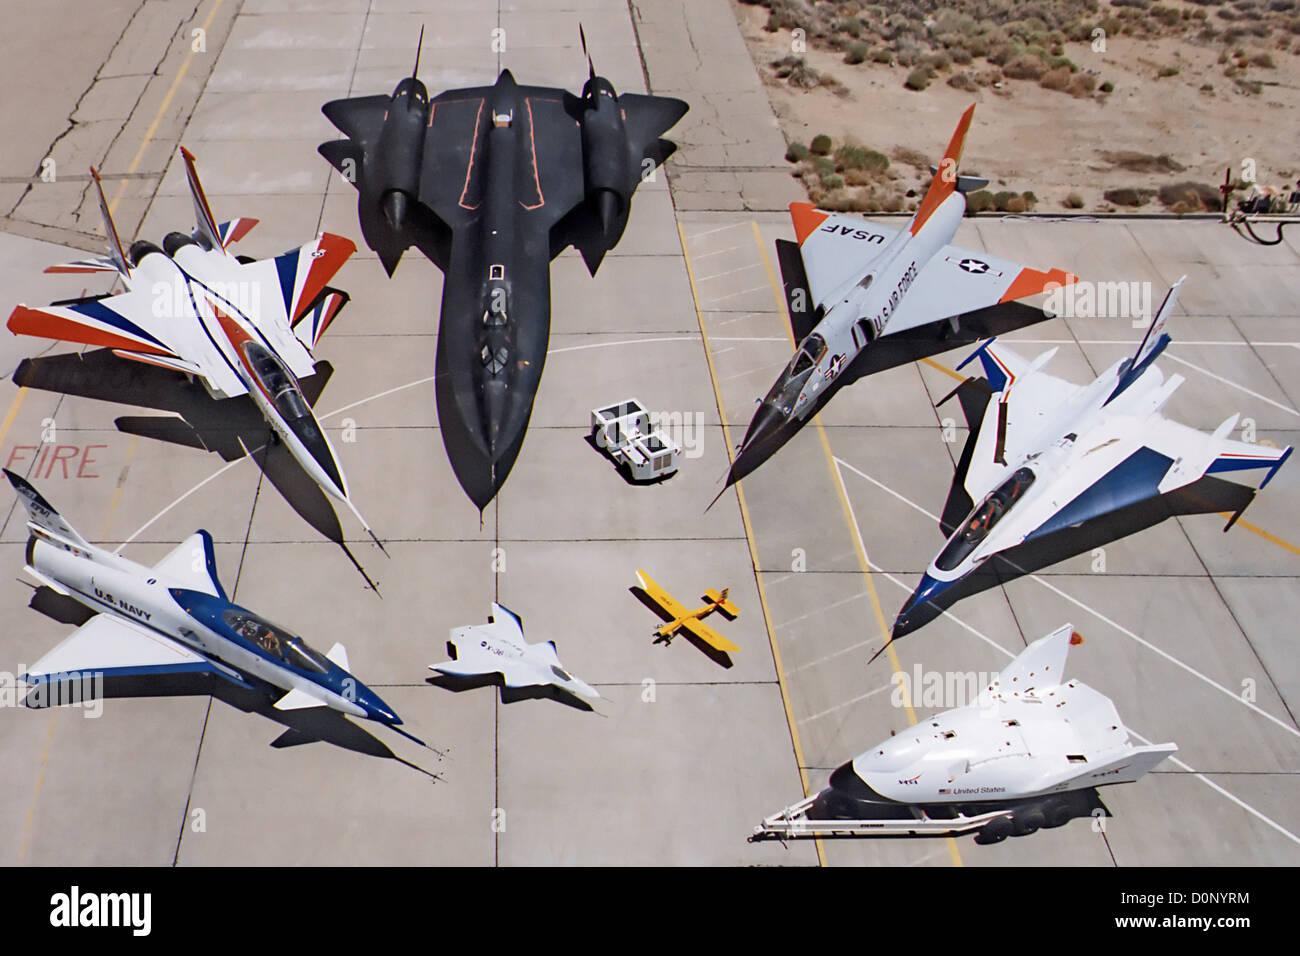 Fleet Of Nasa Planes Stock Photo 52113928 Alamy